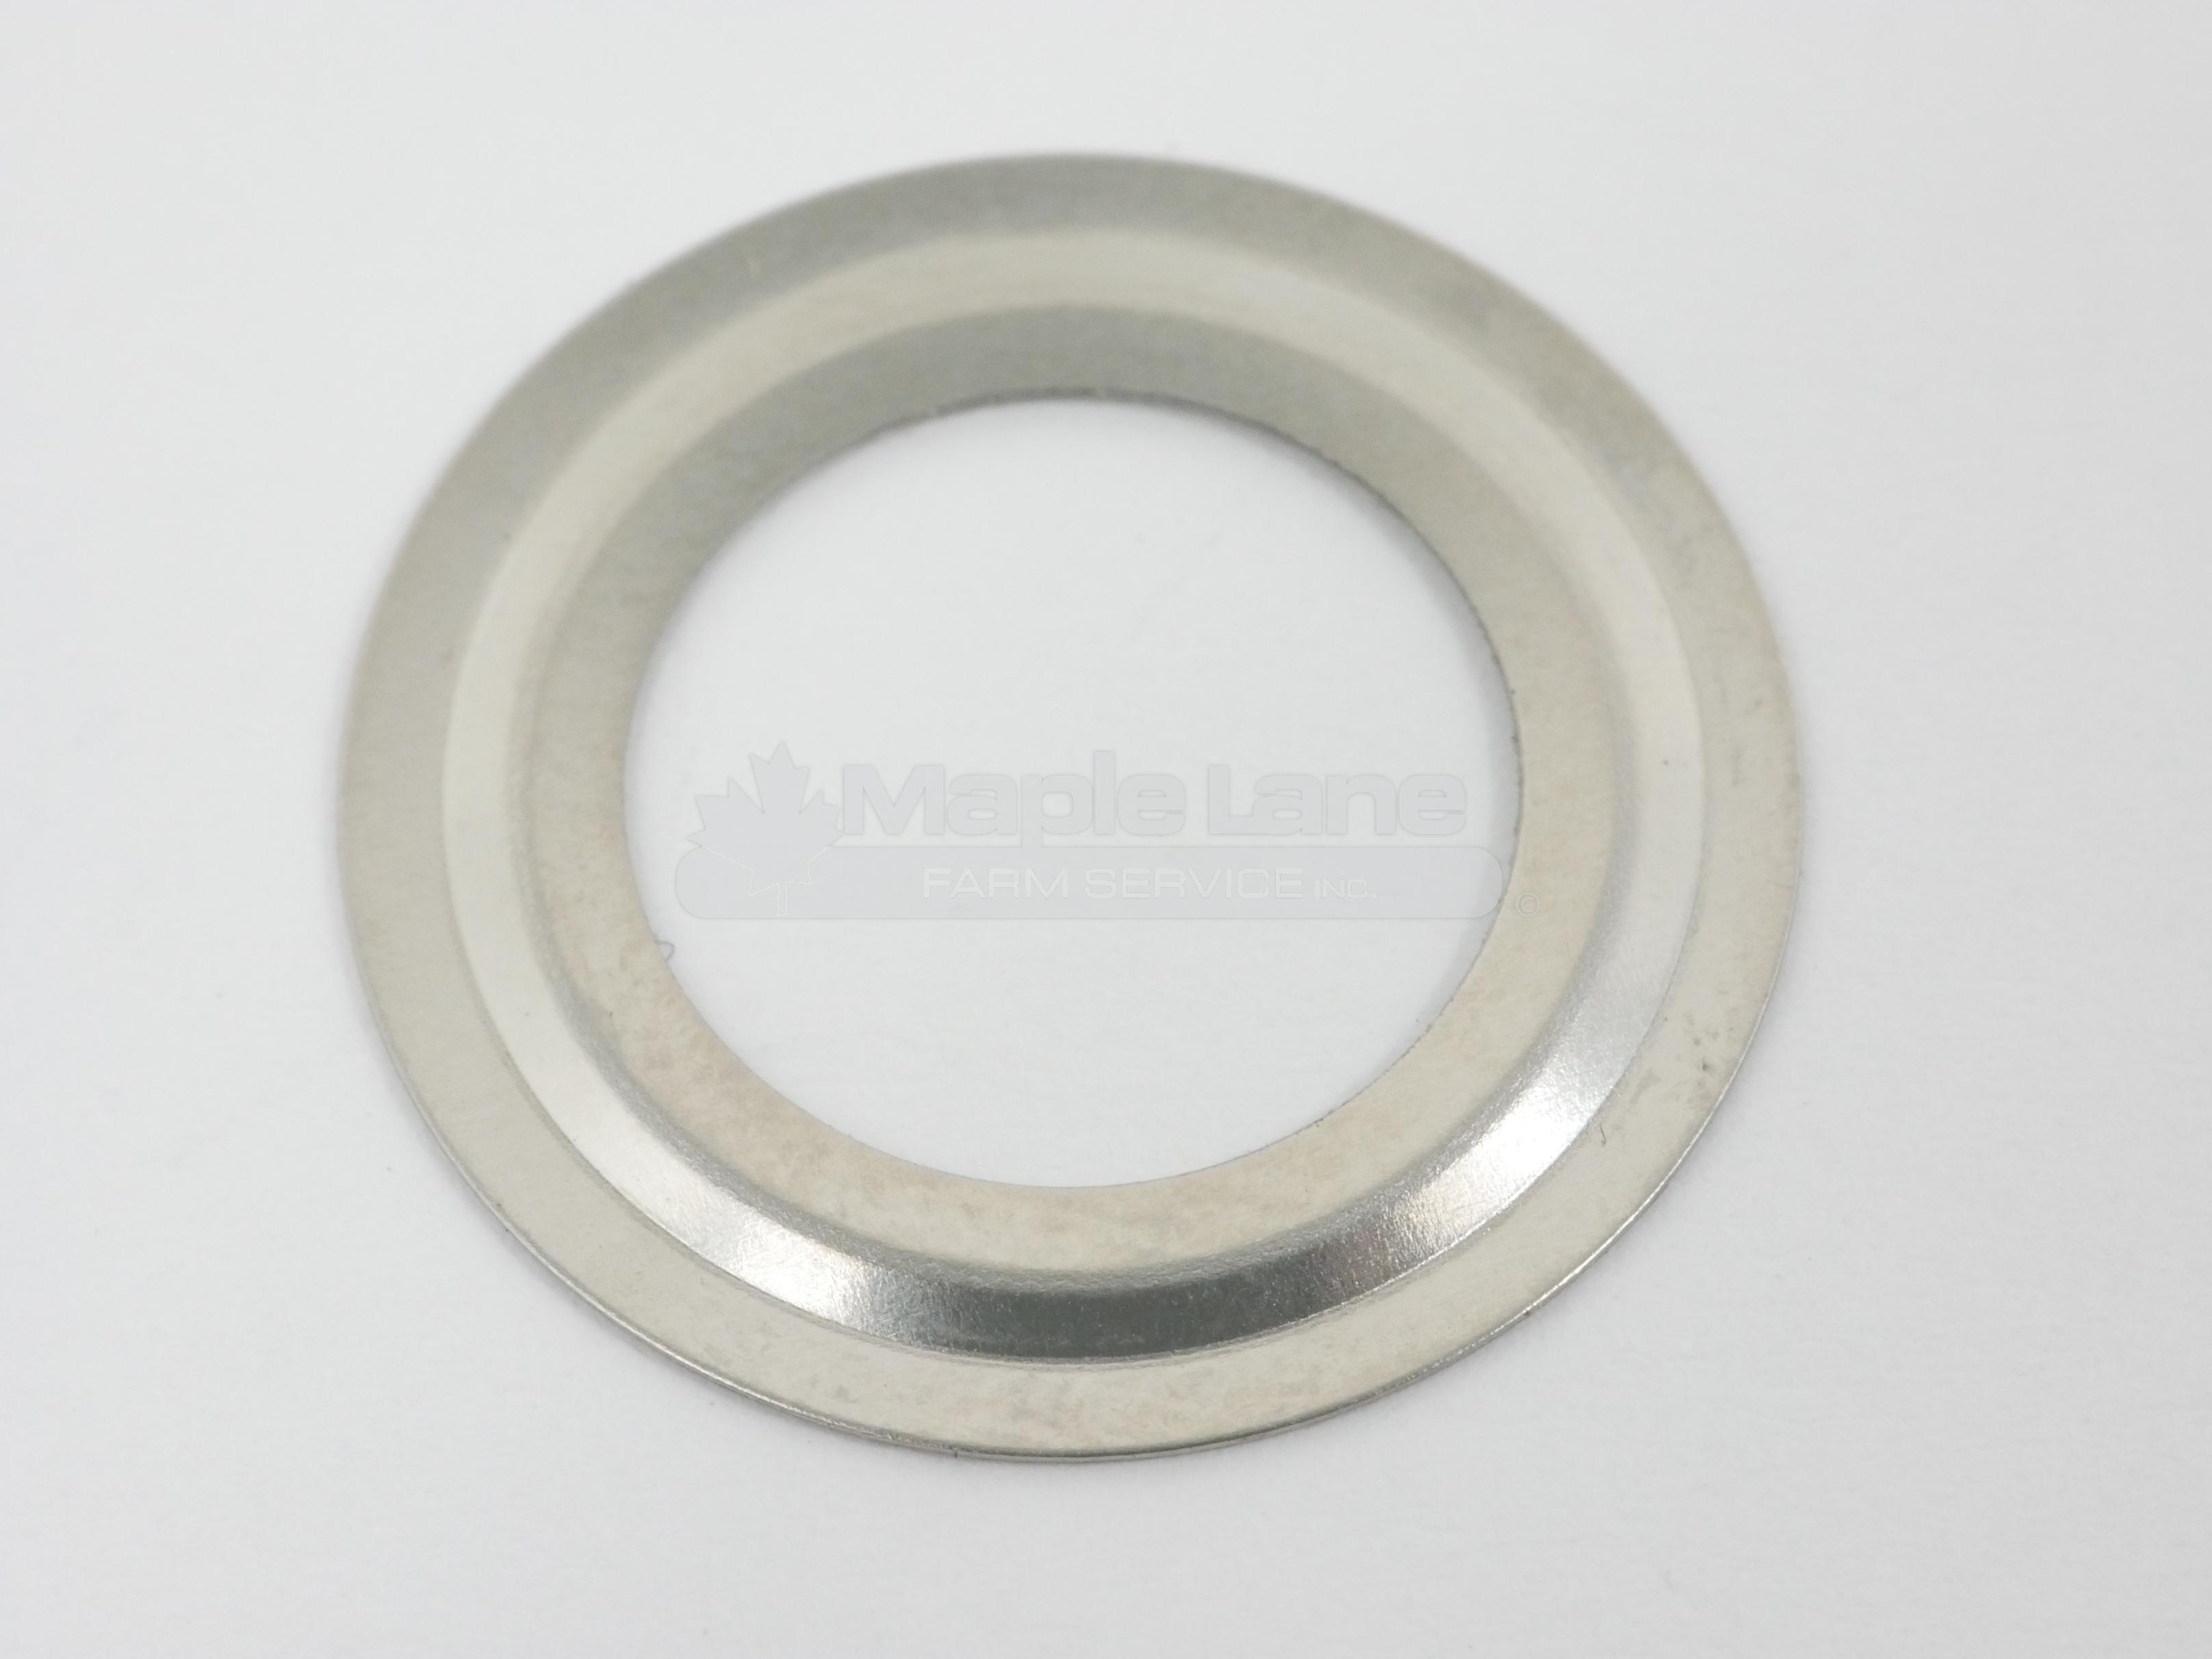 50250326 Injector Gasket